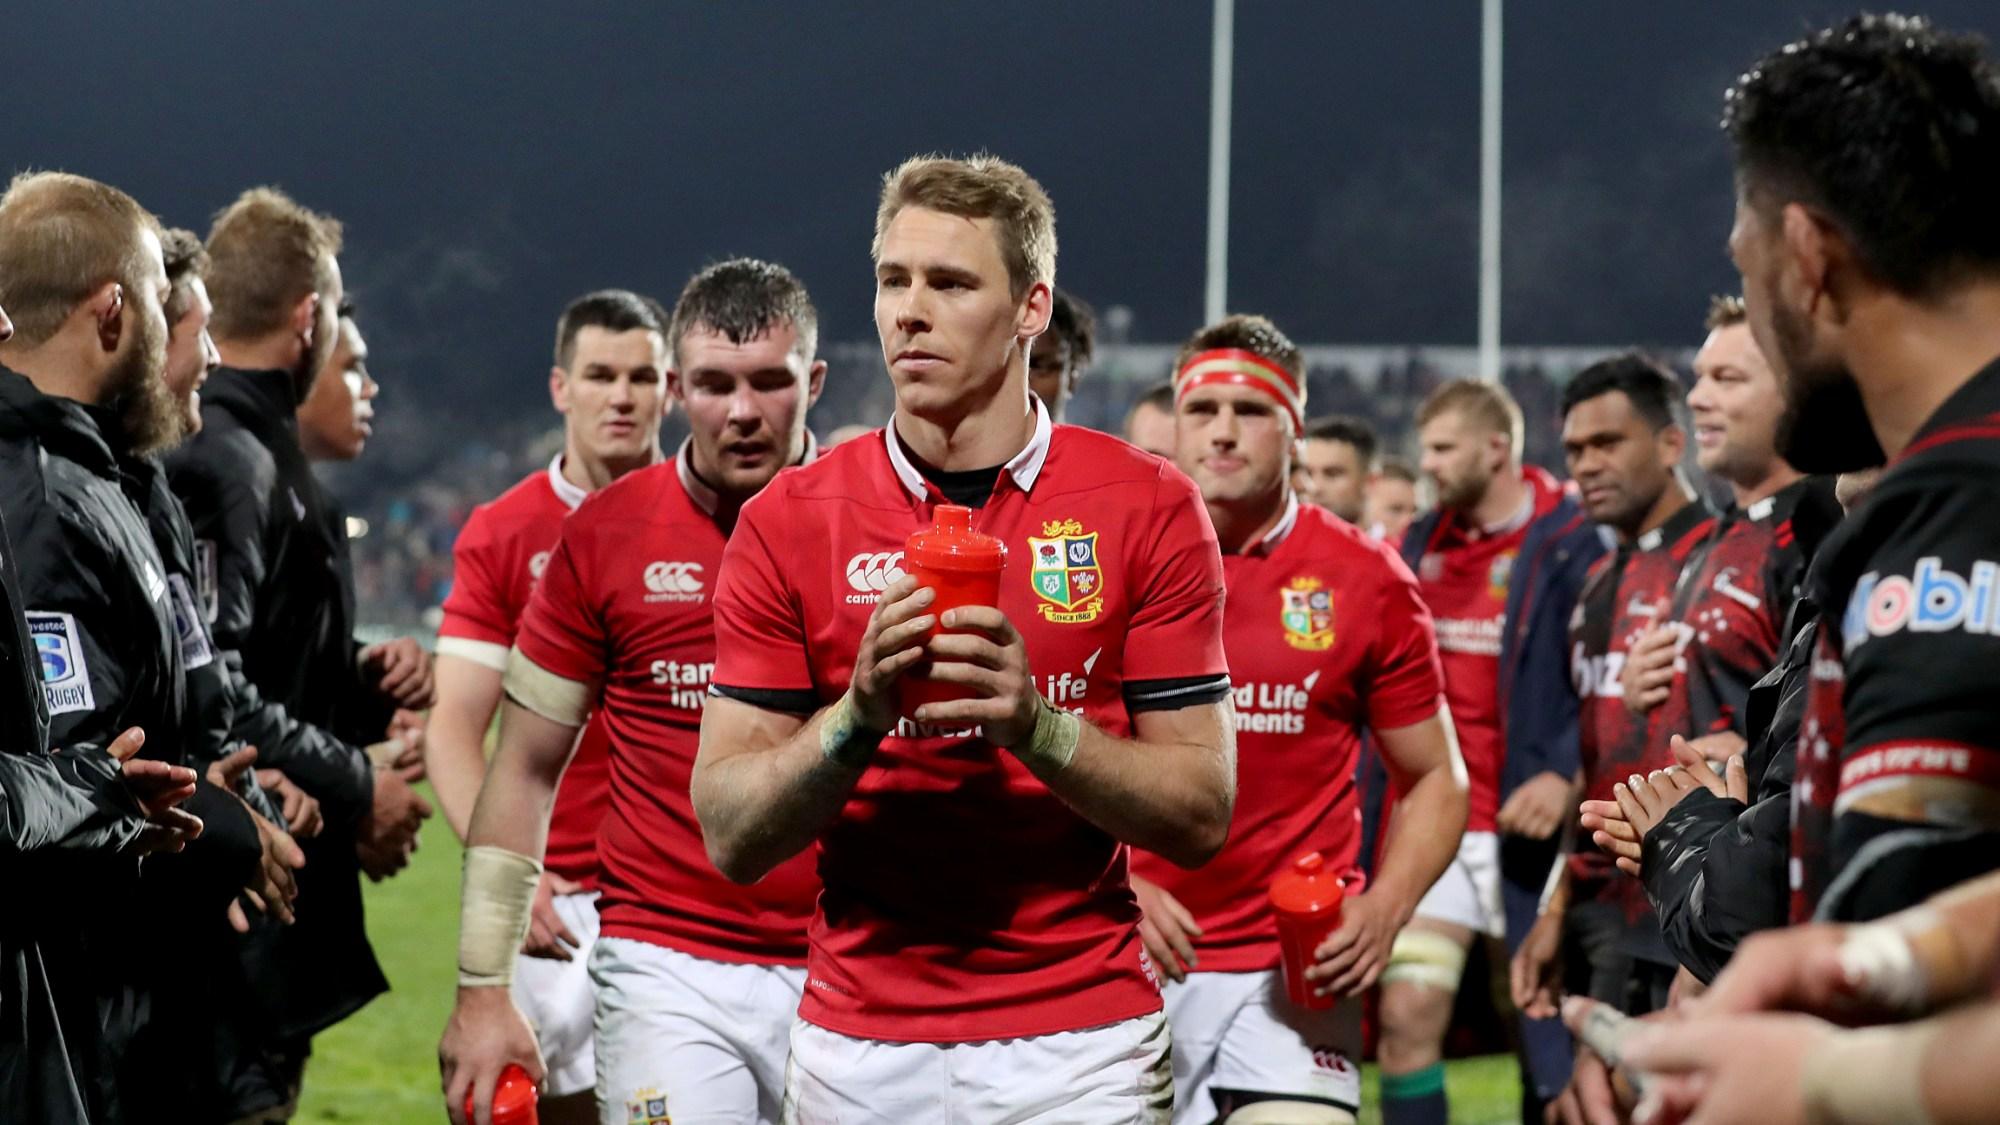 Video: Inside The Tour: Crusaders 3-12 The British & Irish Lions